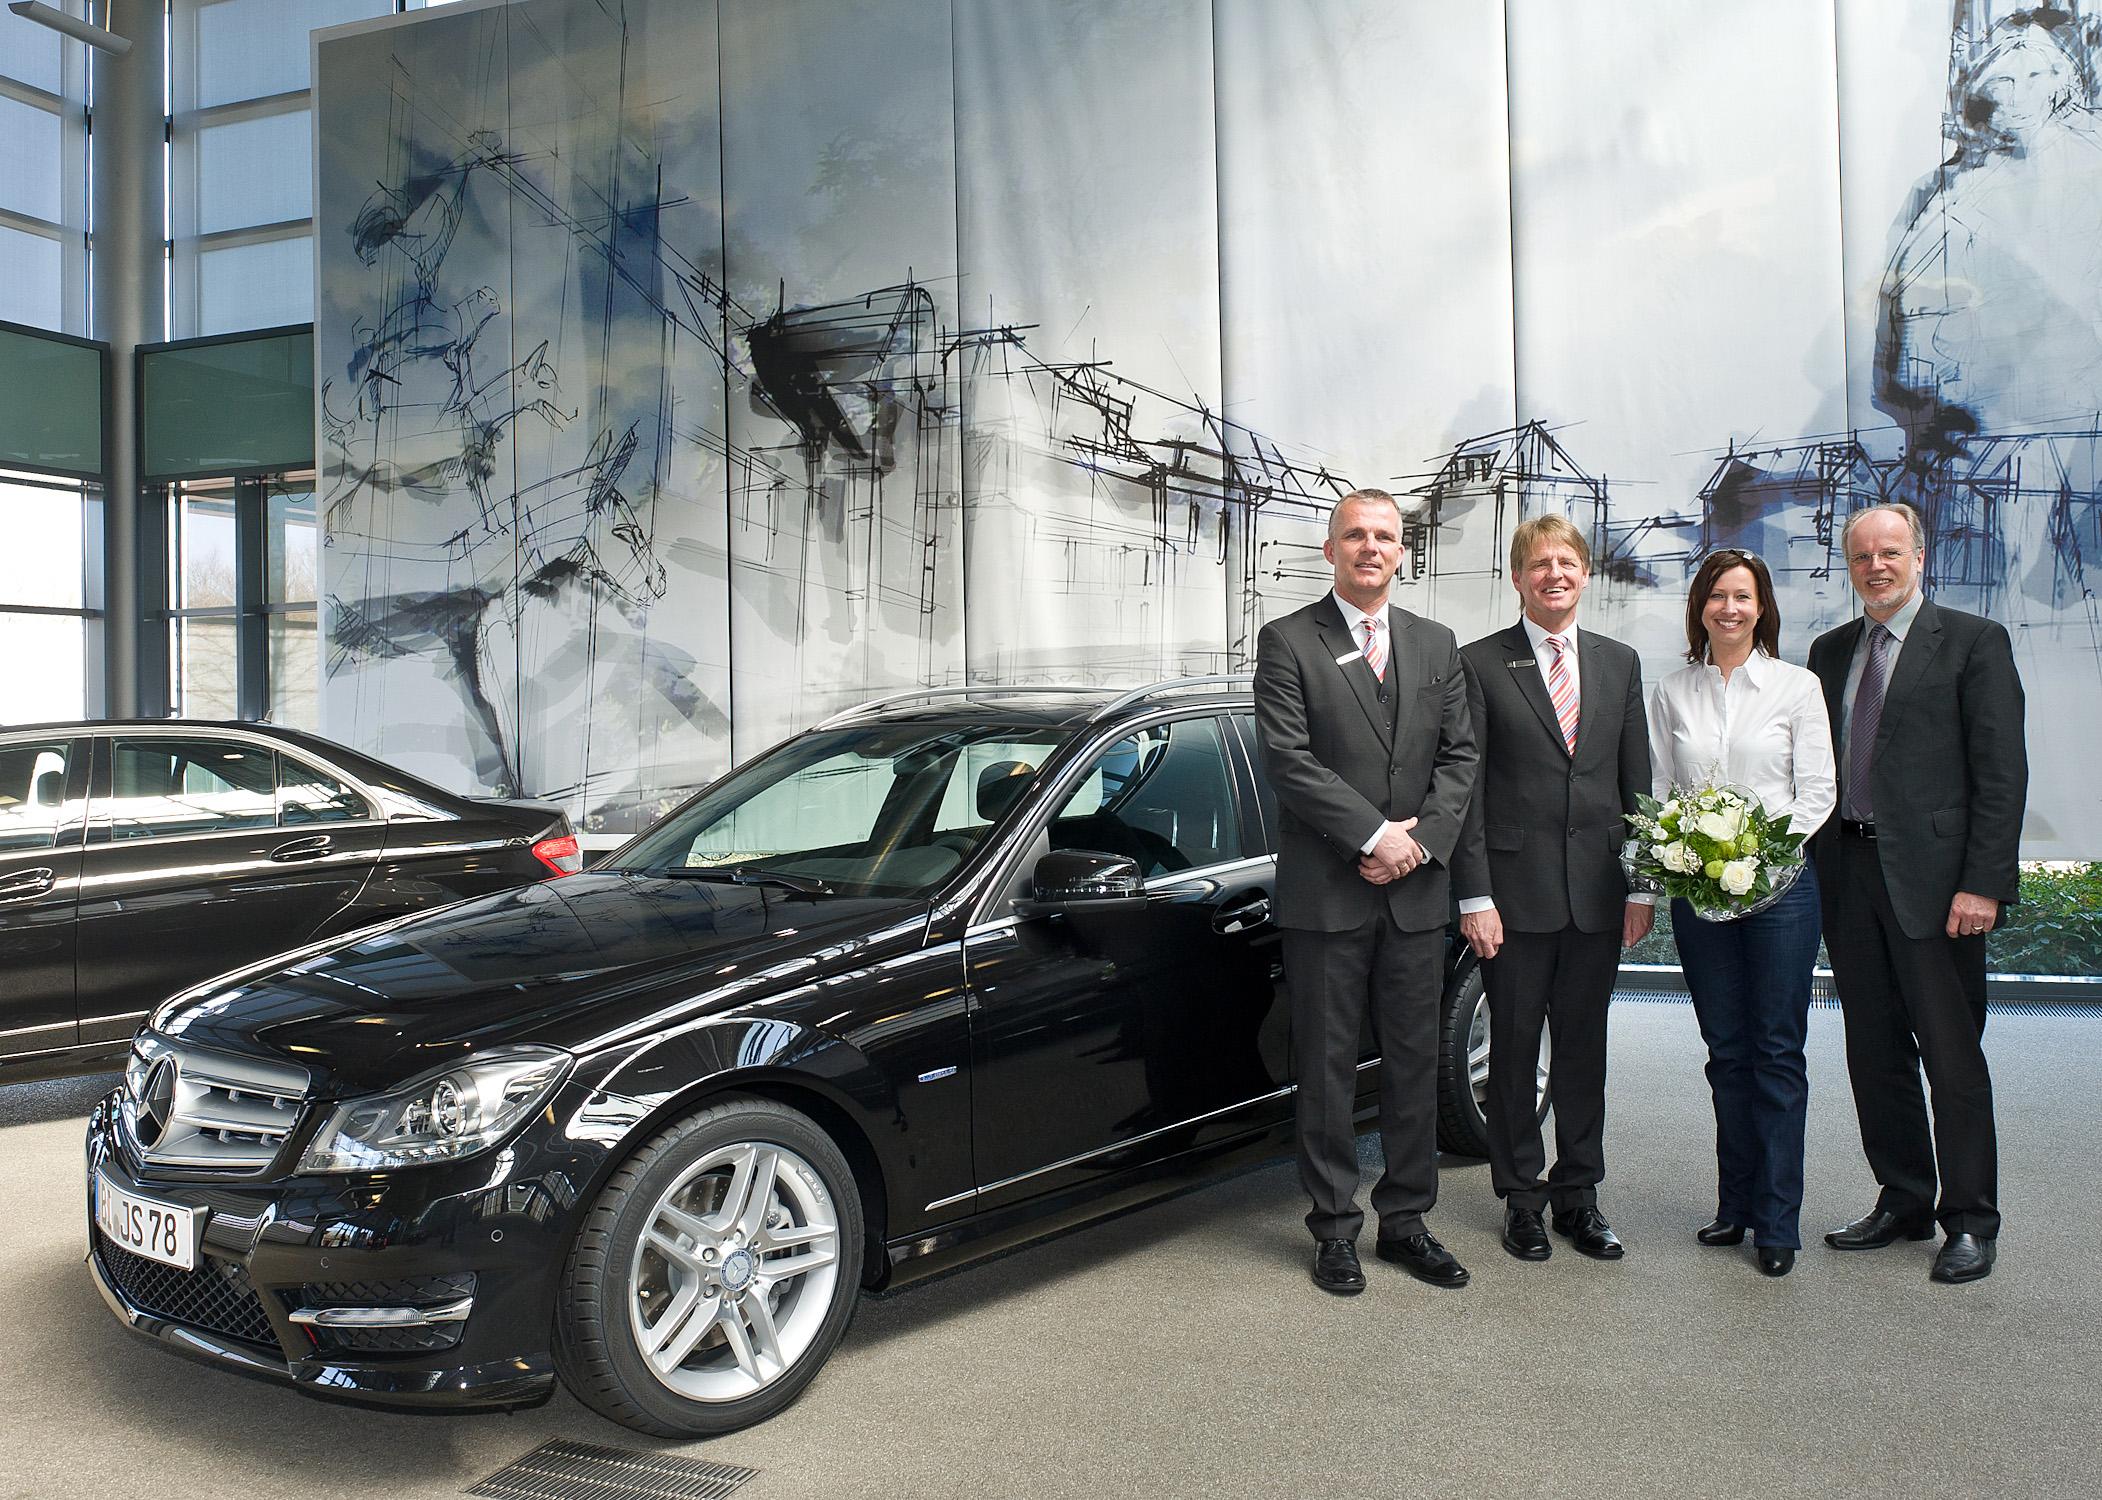 Mercedes Bremen Kundencenter erstes mercedes c klasse t modell an kundin übergeben auto